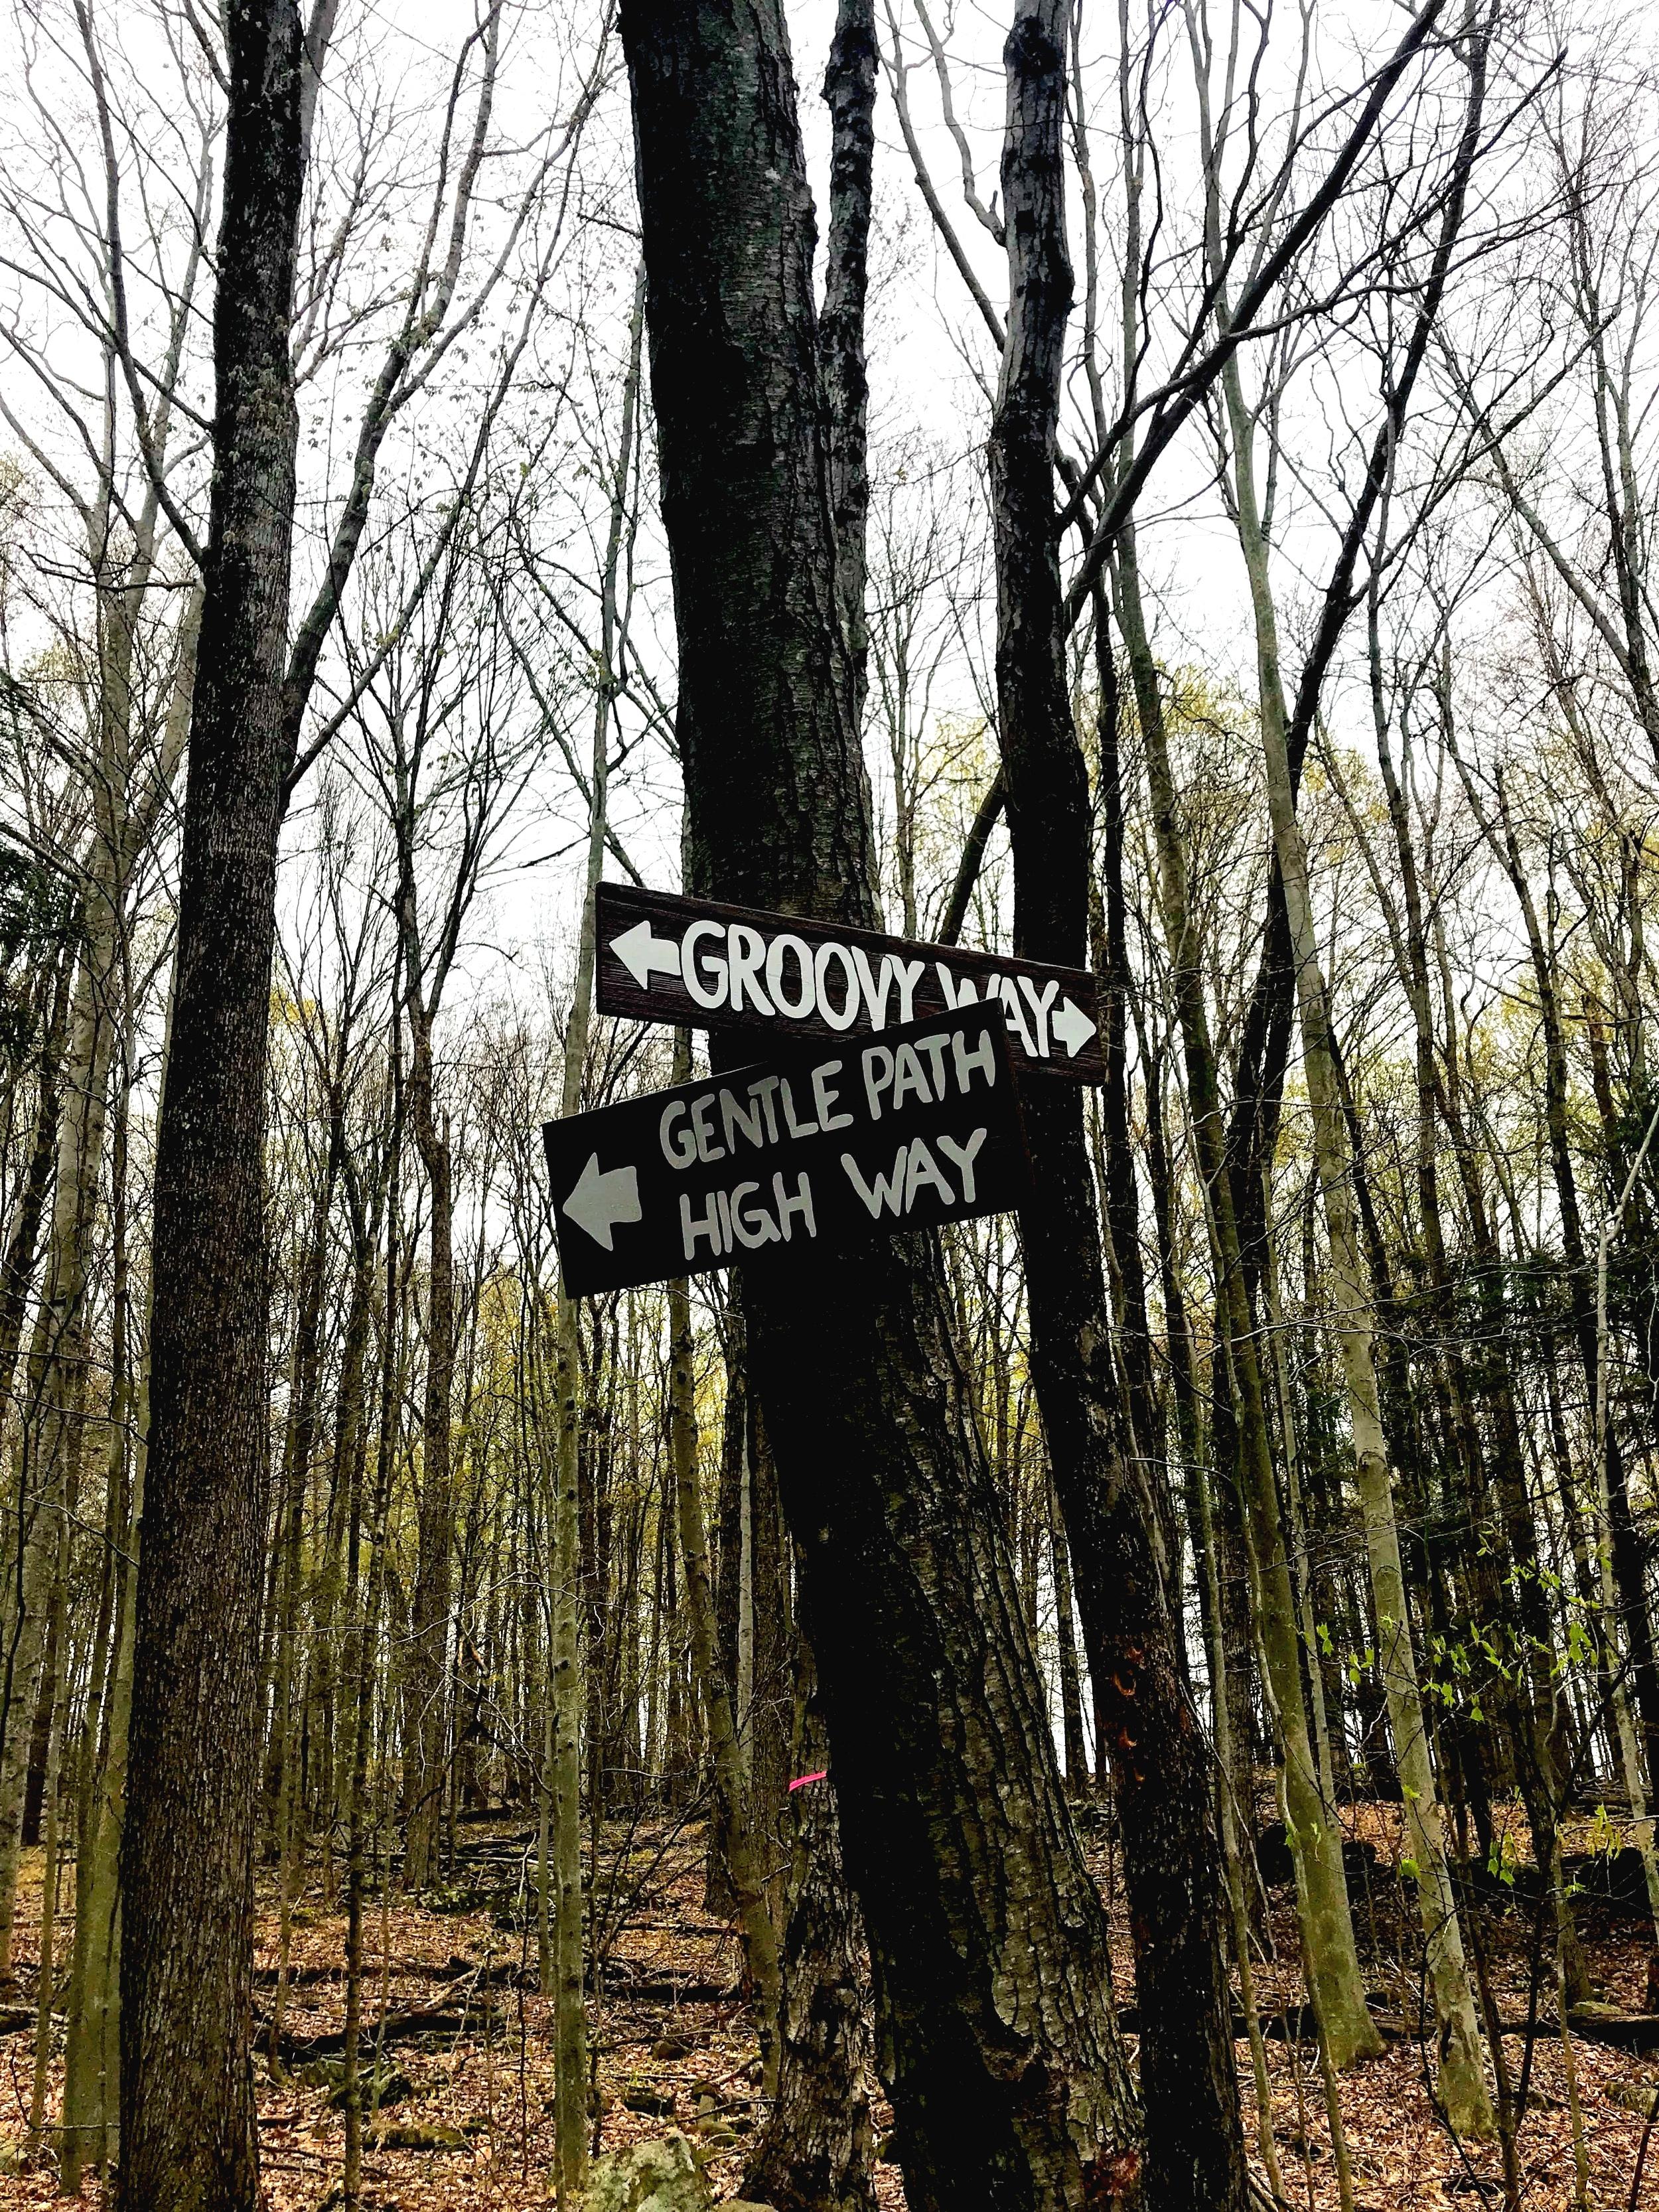 Wayfinding signage along the trails mimic original signs